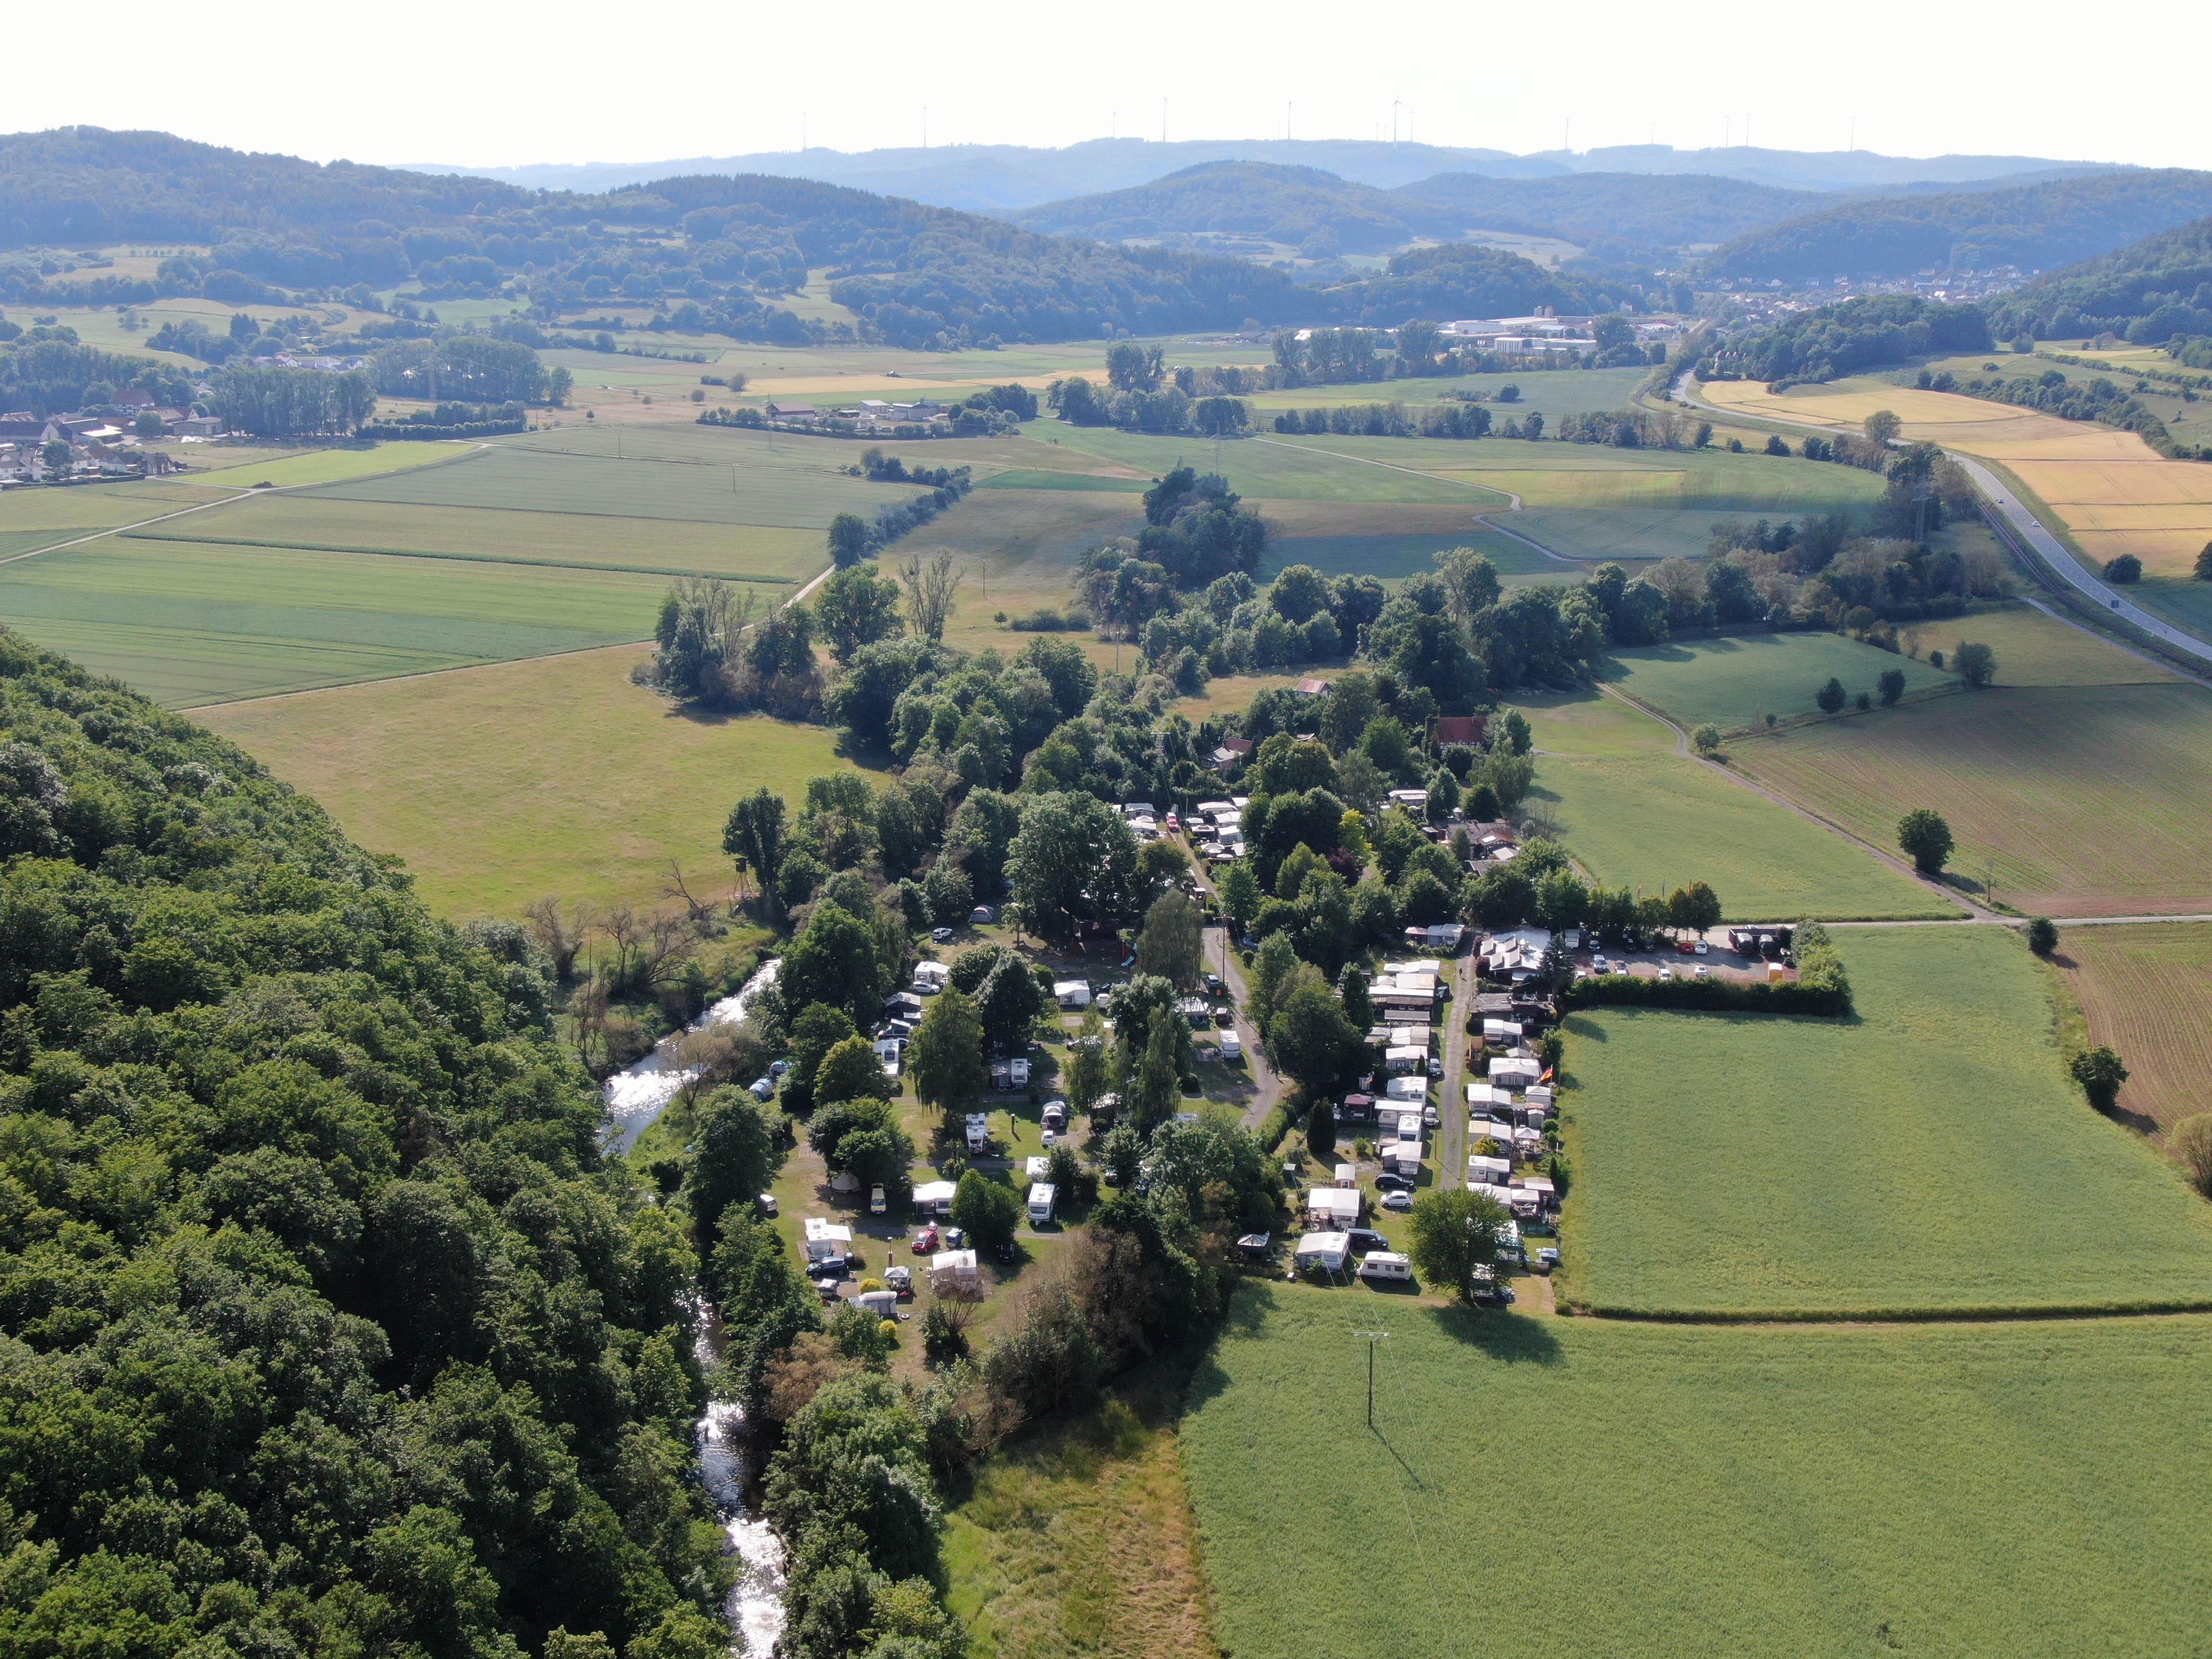 Campingplatz Auenland01